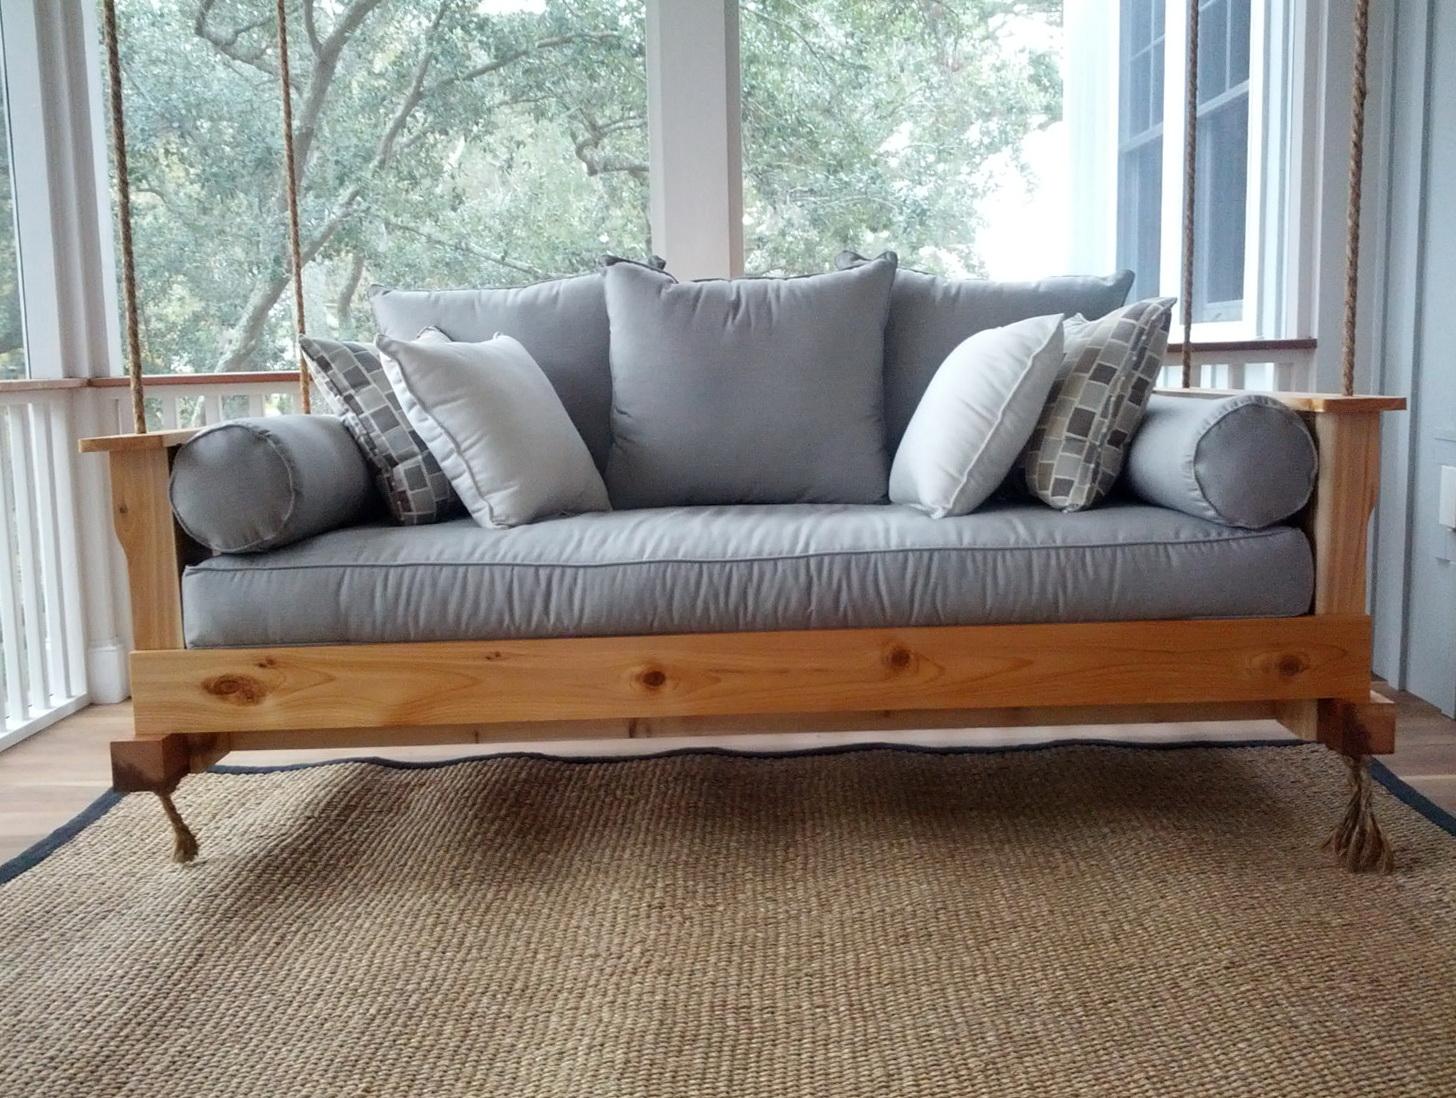 Outdoor Swing Cushions Canada Home Design Ideas